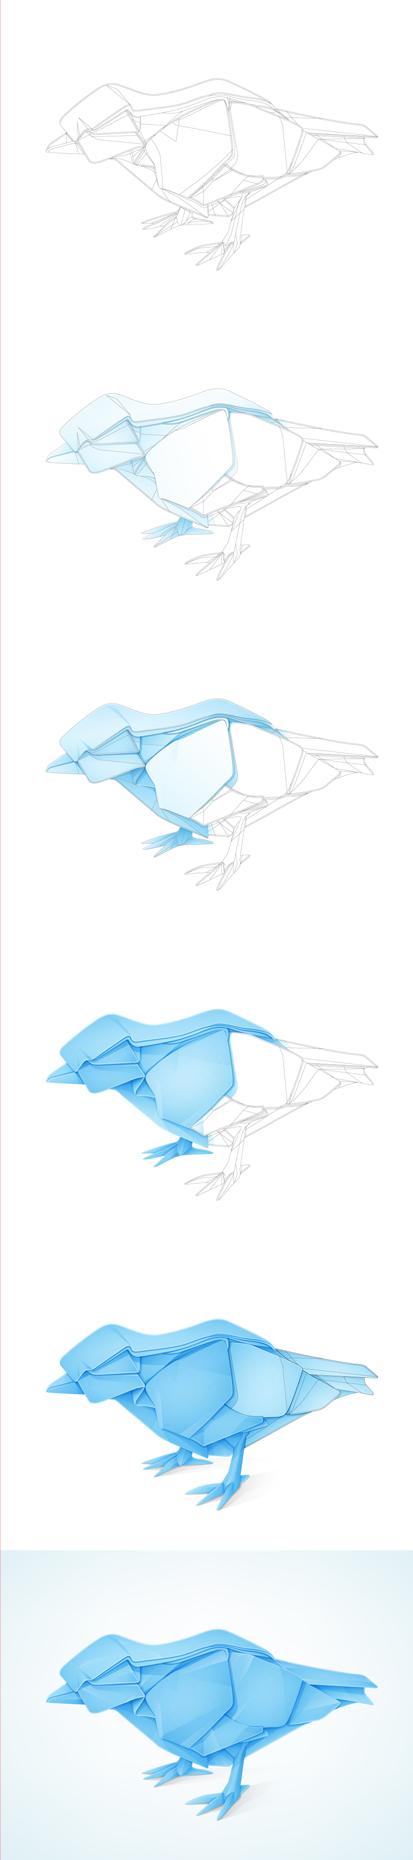 Twitterbird origami